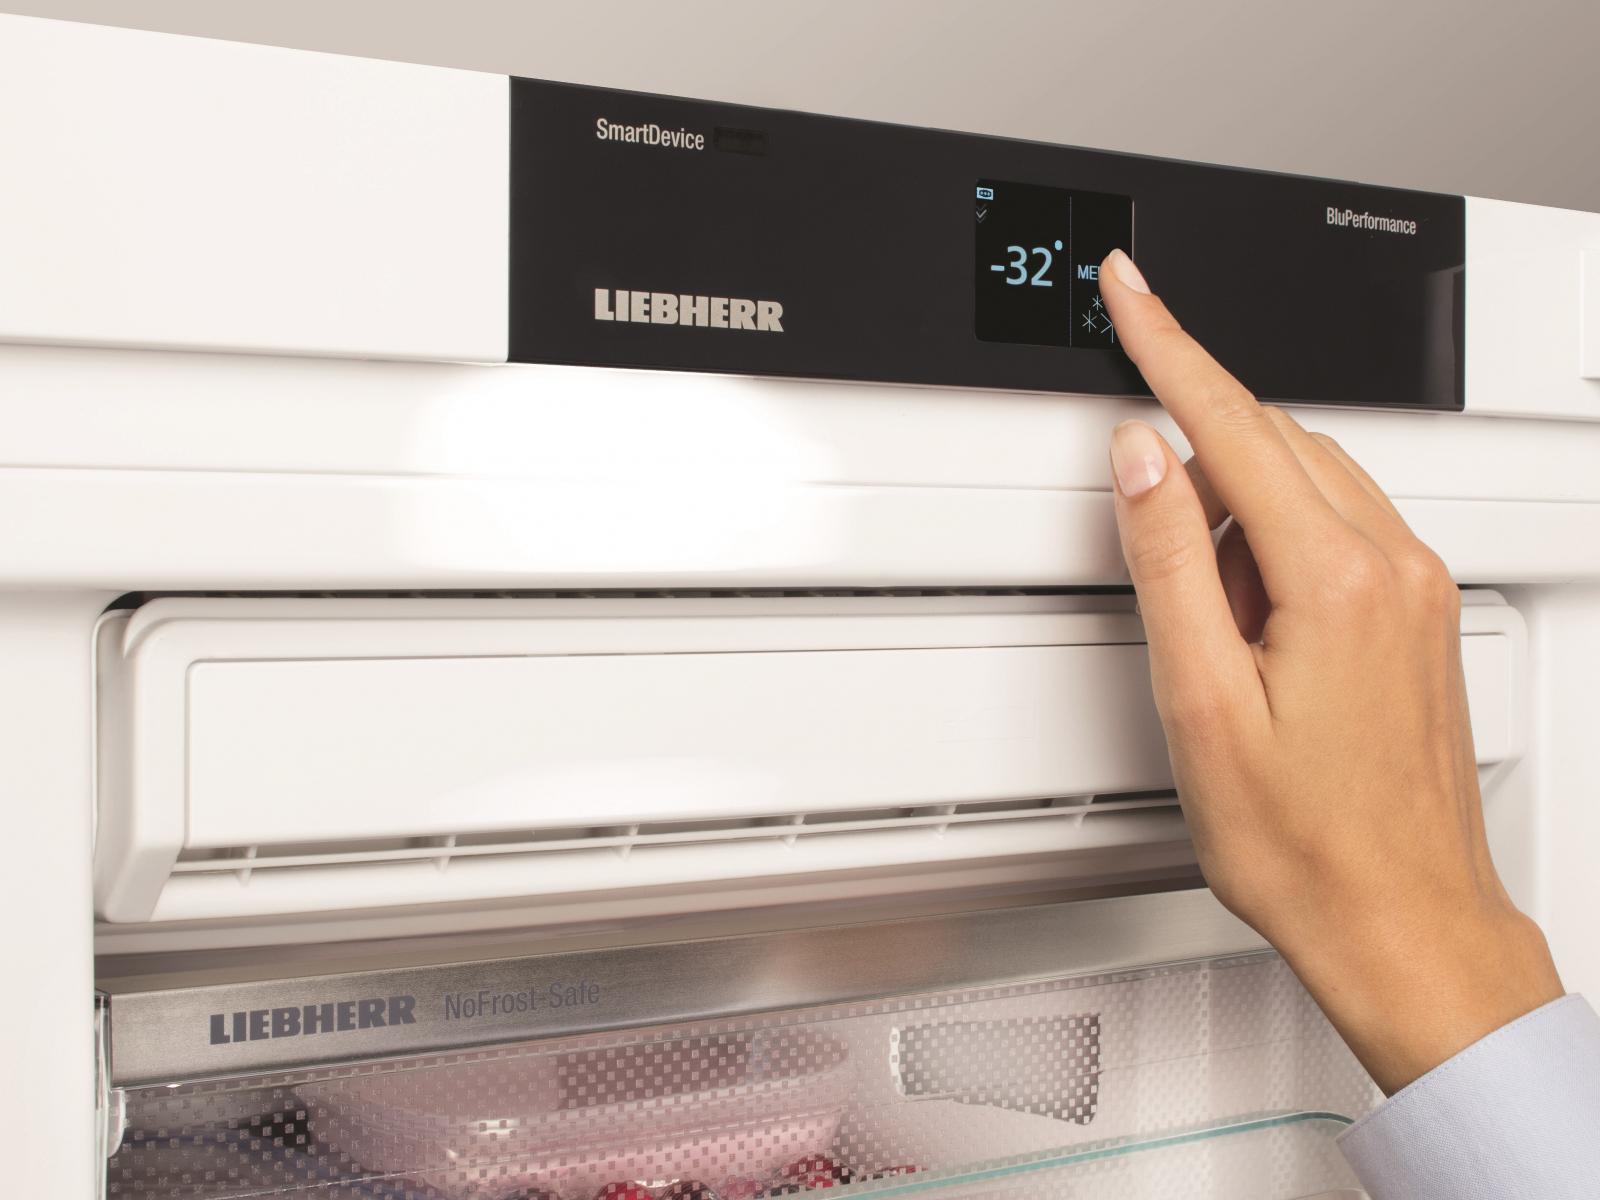 купить Side-by-Side холодильник Liebherr SBSes 8663 Украина фото 17